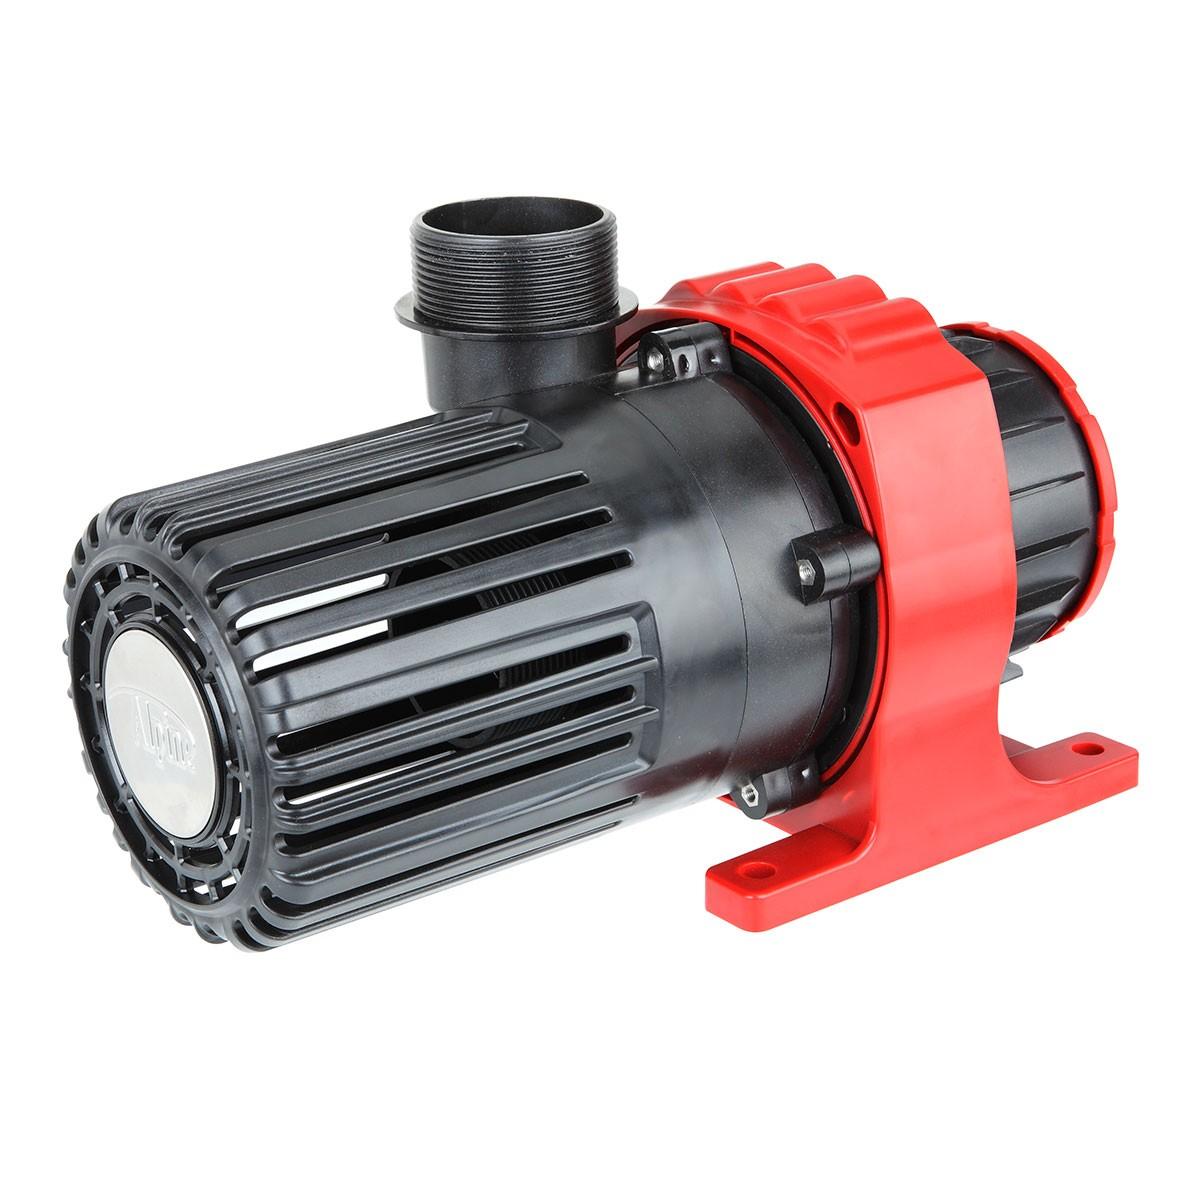 Eco-Twist Pond Pump